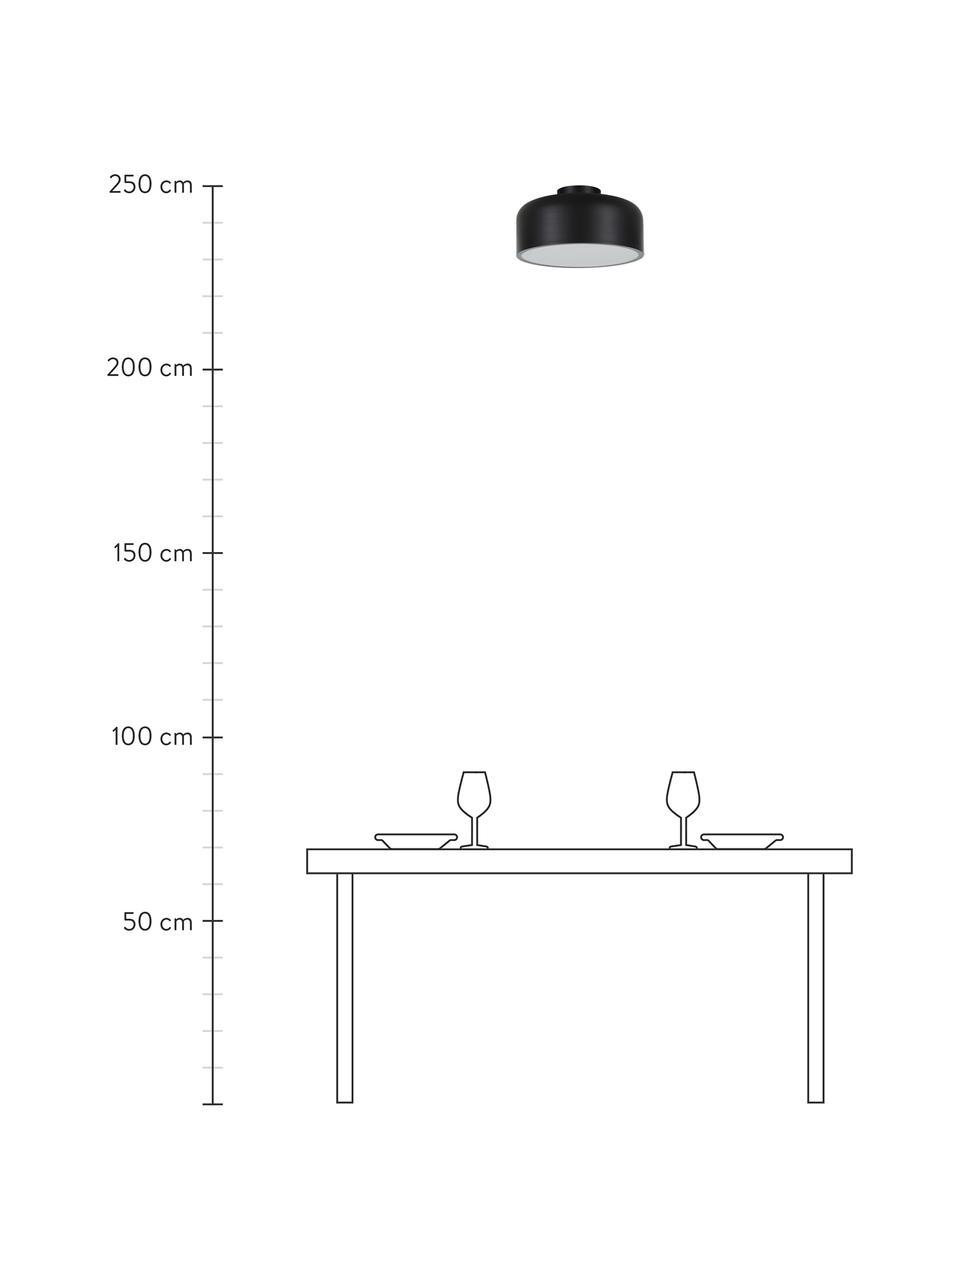 Deckenleuchte Ole aus Metall, Lampenschirm: Metall, pulverbeschichtet, Baldachin: Metall, pulverbeschichtet, Diffusorscheibe: Acryl, Schwarz, matt, Ø 35 x H 18 cm